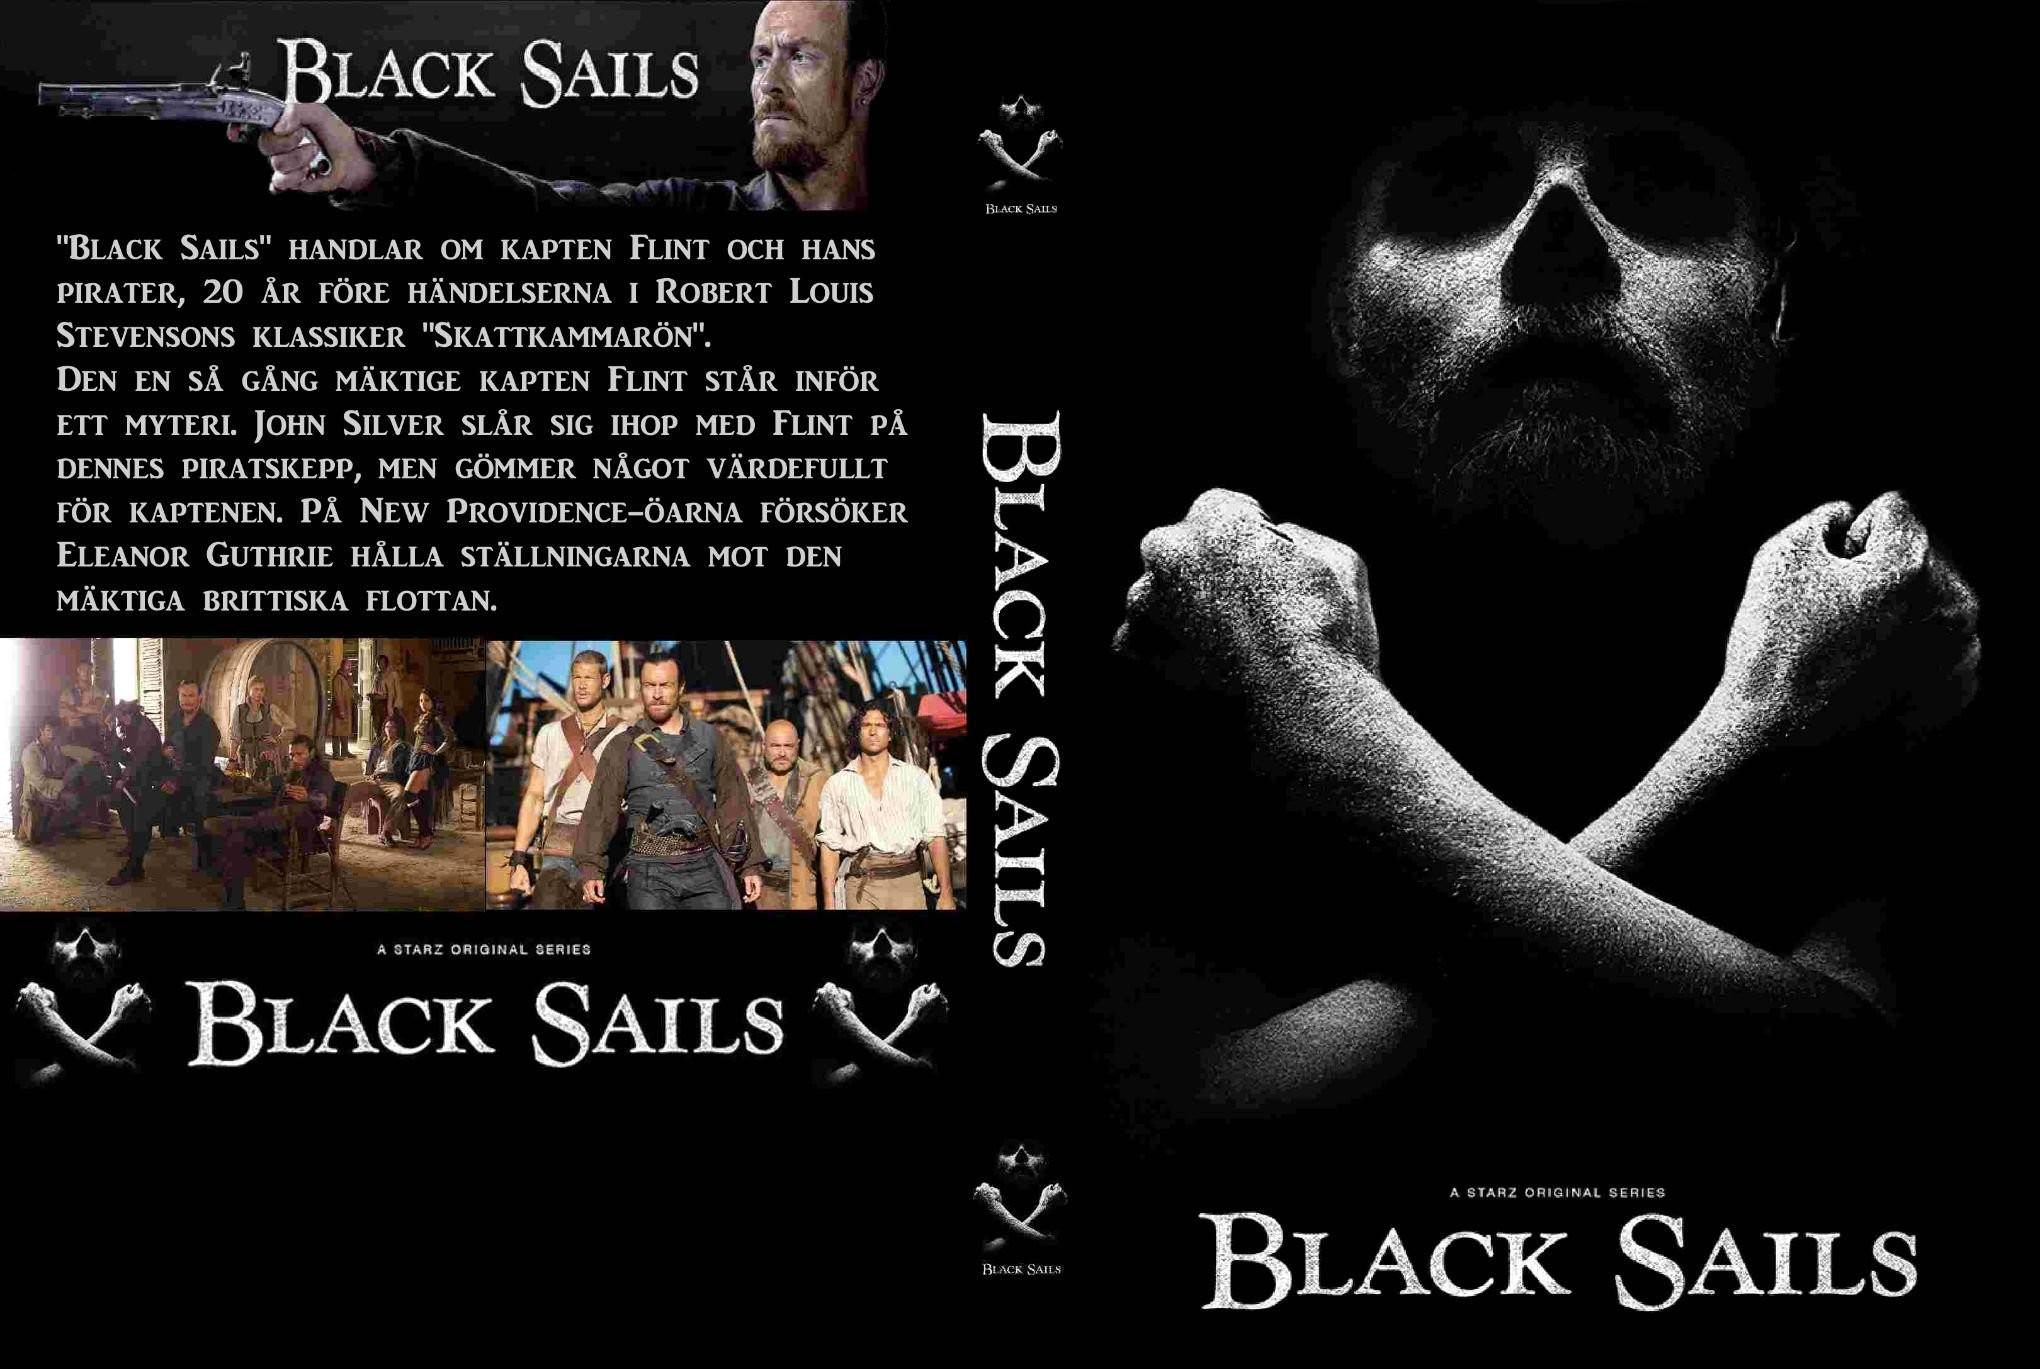 BLACK SAILS adventure drama fantasy series television pirates pirate starz  (13) wallpaper | | 352246 | WallpaperUP